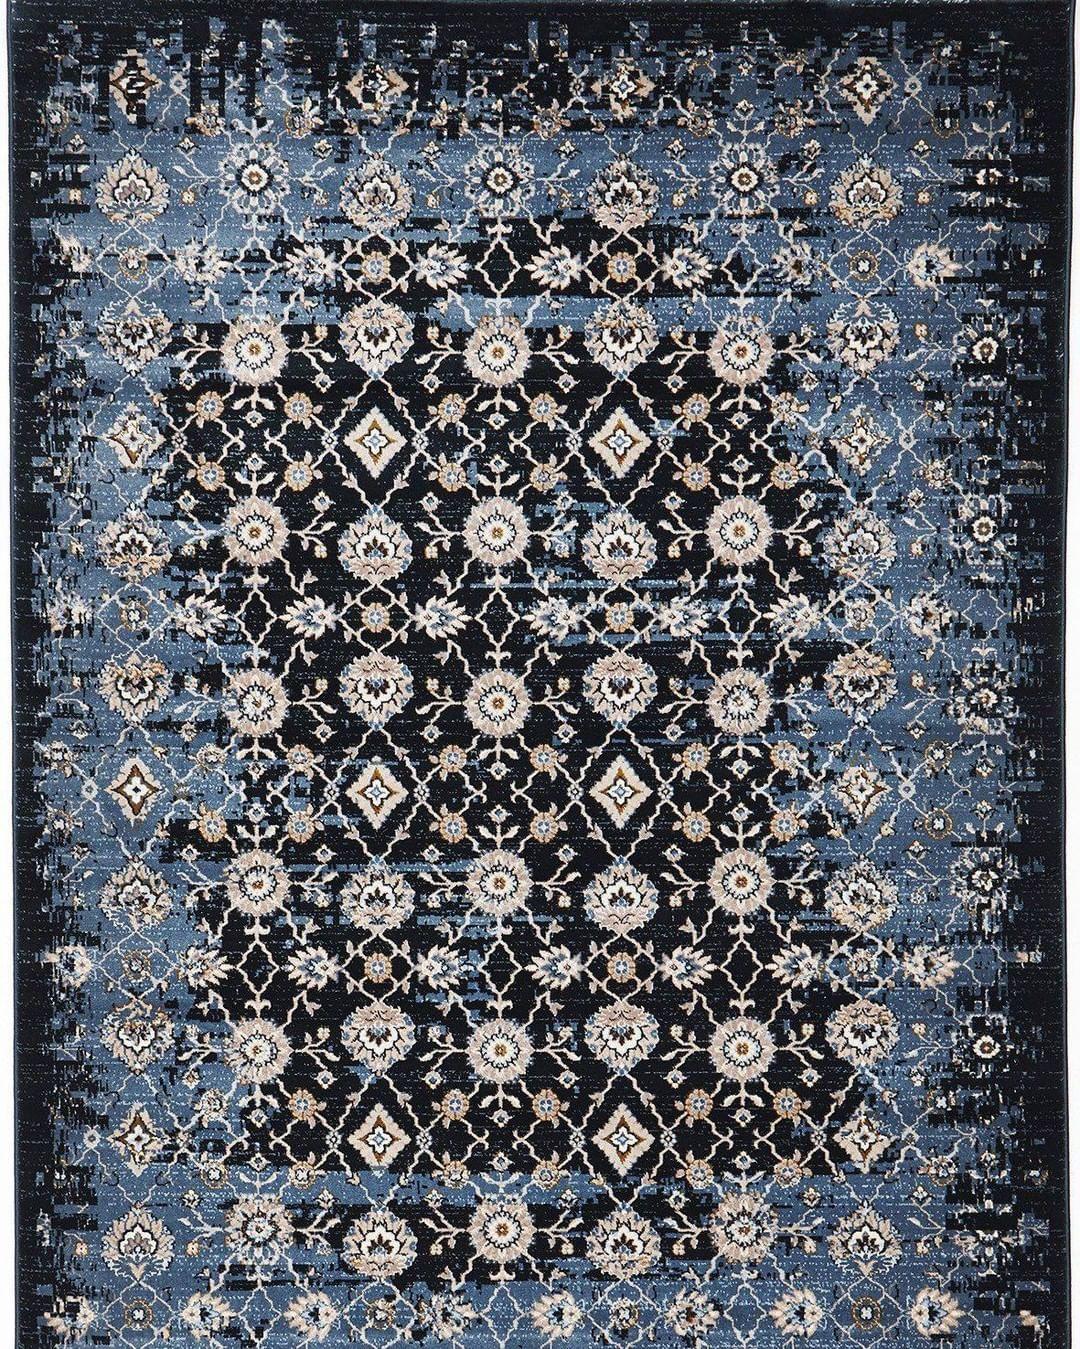 Sydneyrugsonline Posted To Instagram Royal Kashan Designer Rug Blue Navy An Exquisite Line Of Fine 1 Million Point M Machine Made Rugs Rugs Online Rug Design